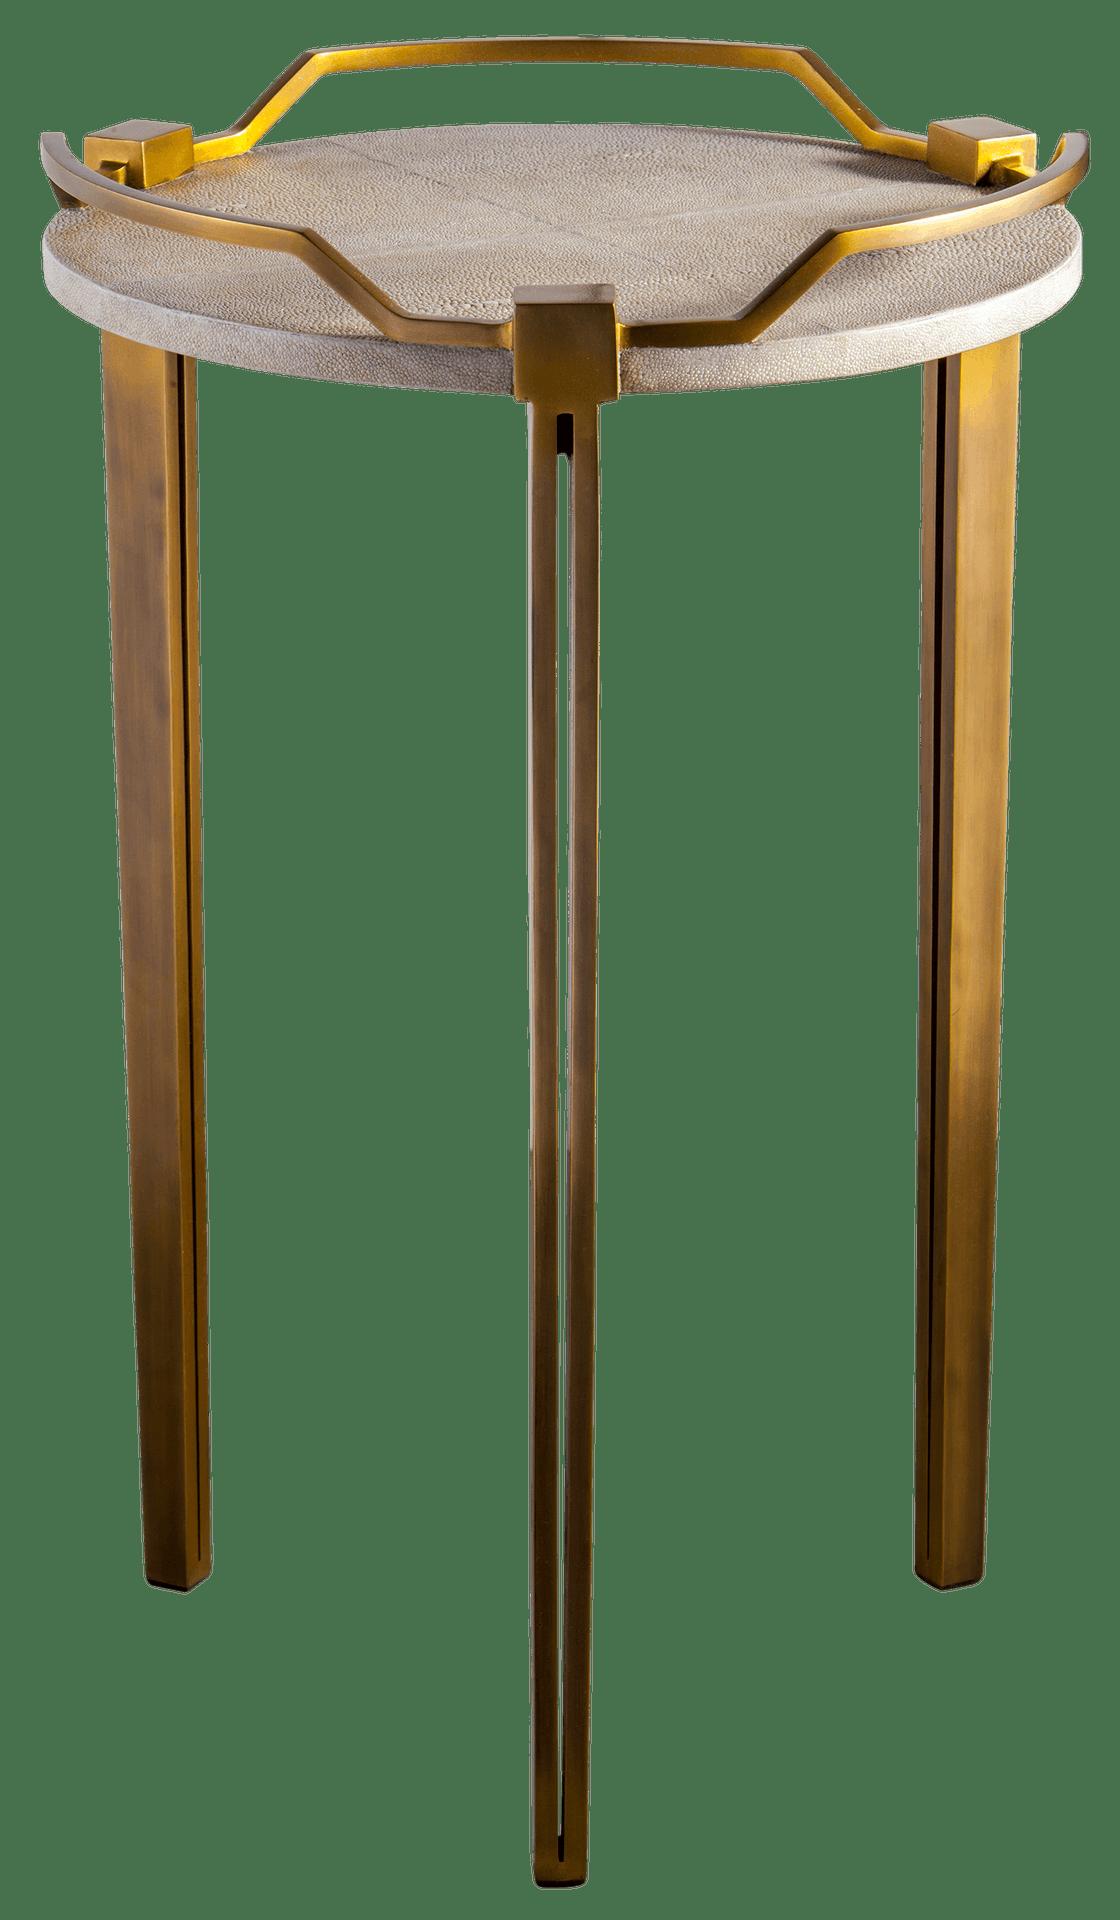 Putnam Mason Shagreen Brass Accent Table Furniture Furniture